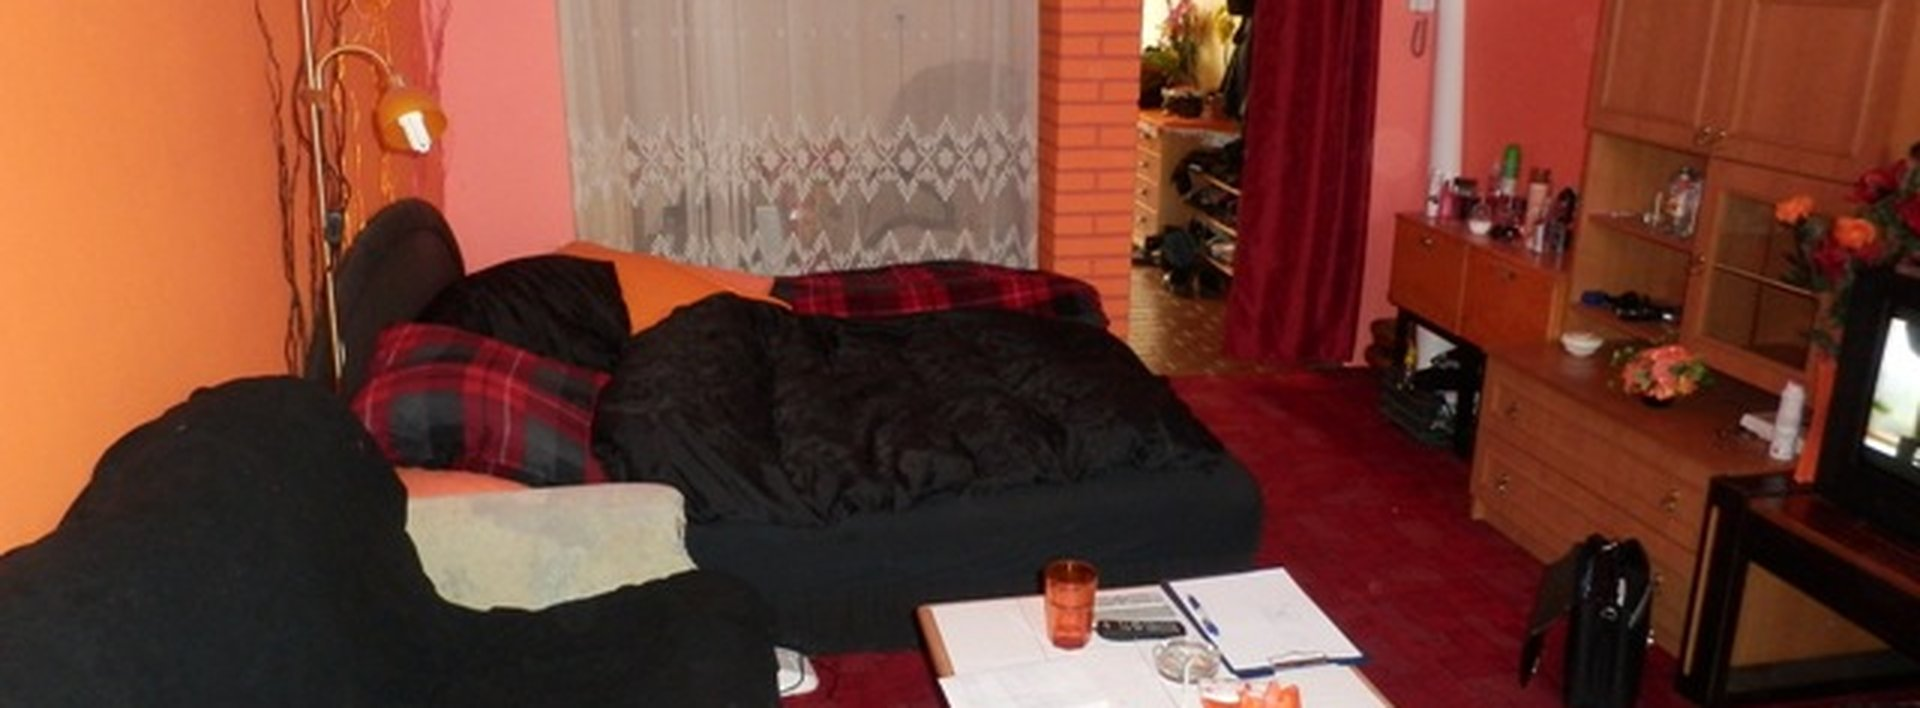 Pronájem bytu 1+1 v Lázních Bohdaneč, 40m², Ev.č.: N46311